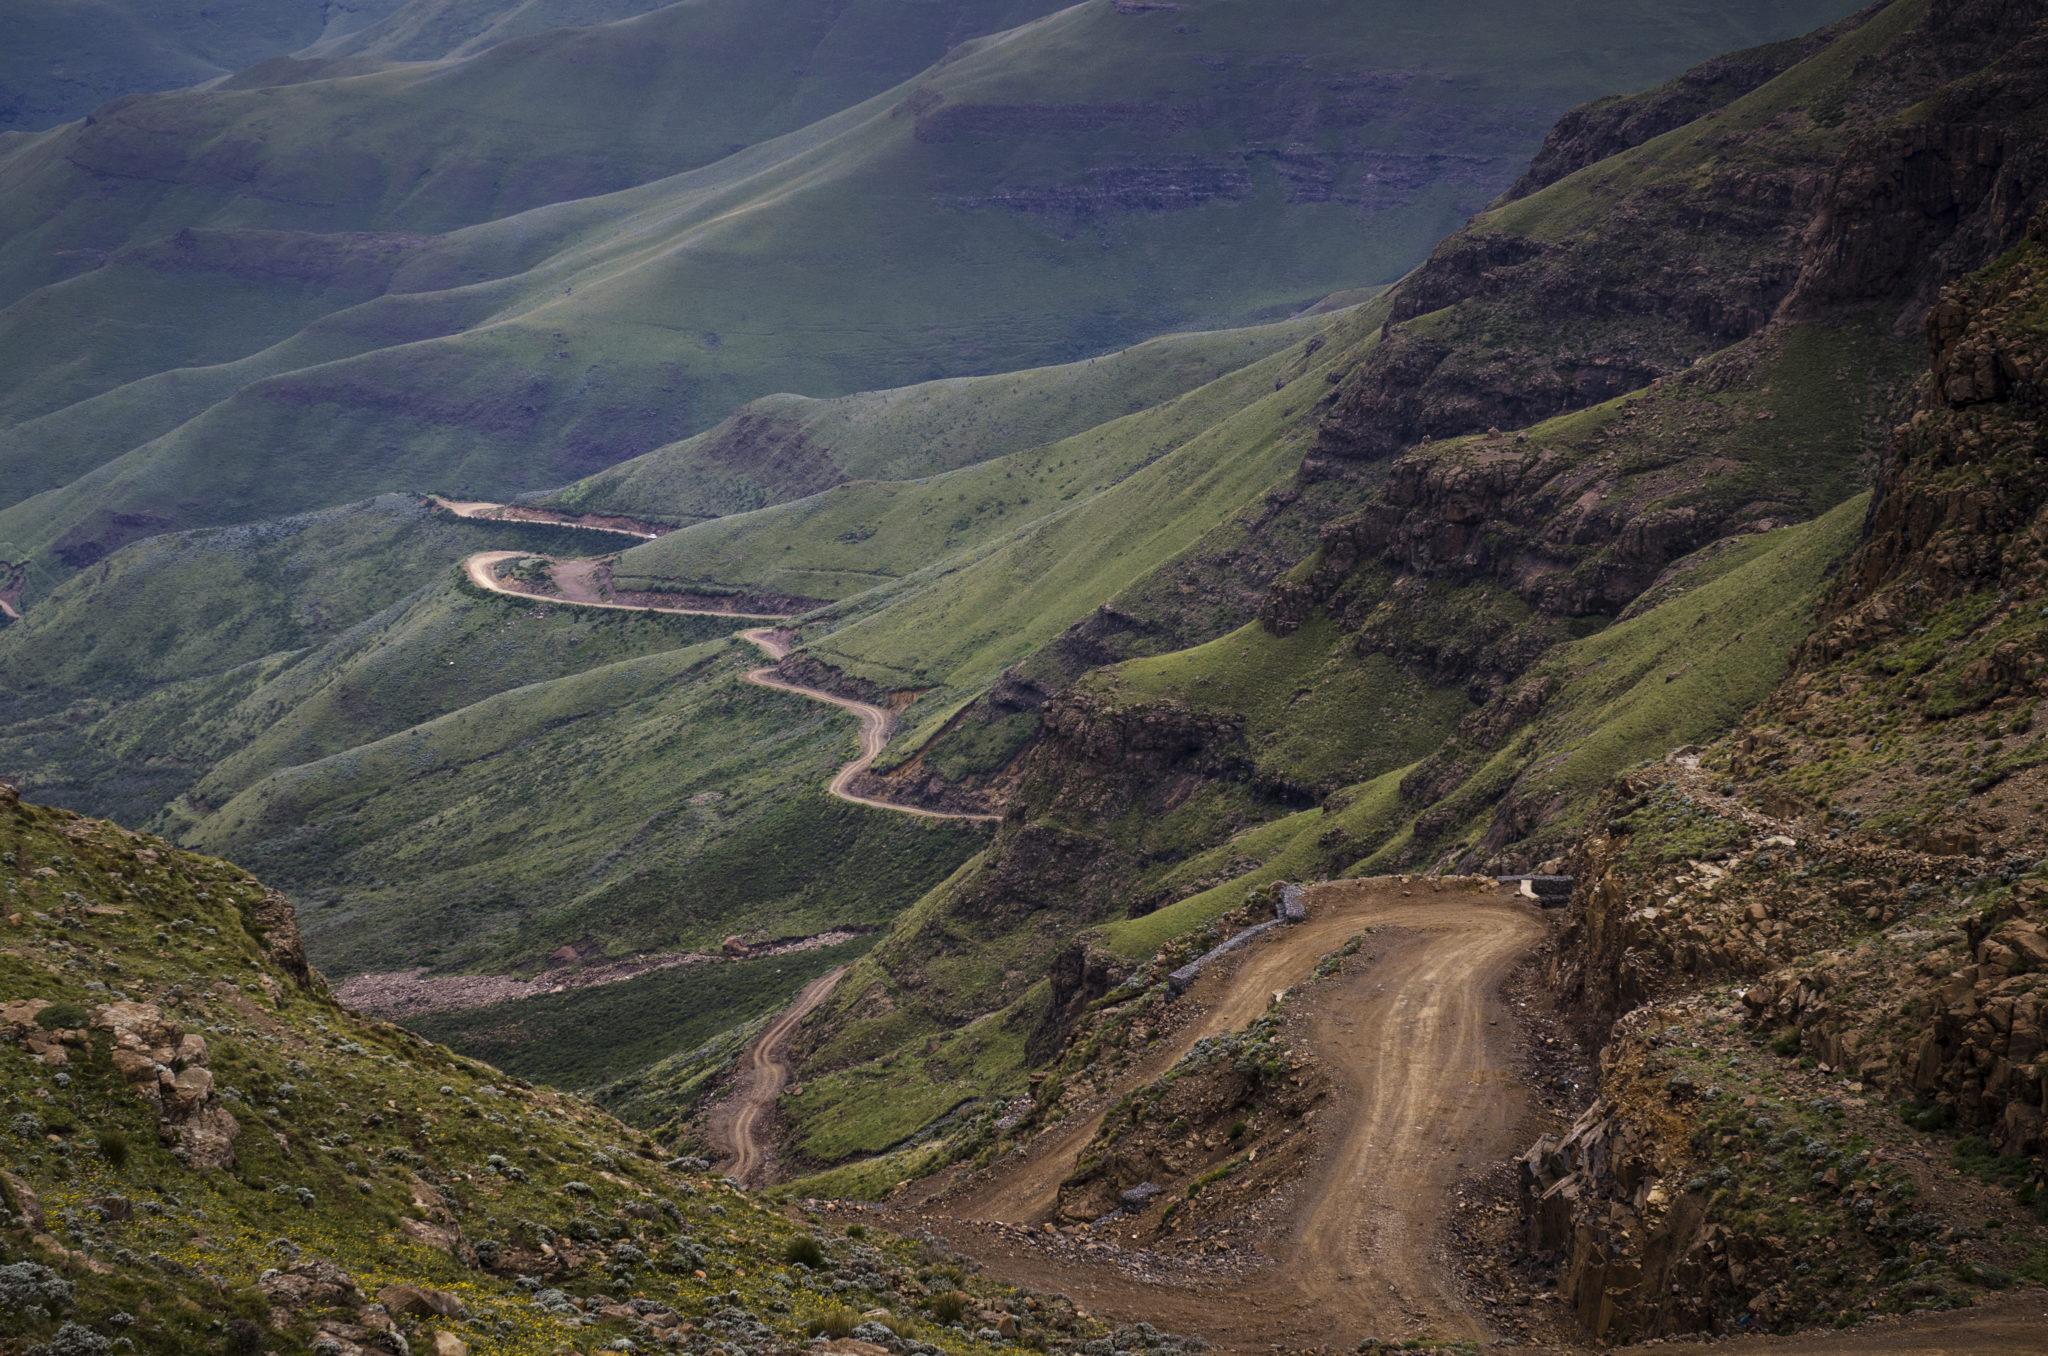 Sani-Pass-Drakensberg-South-Africa-mountain-pass